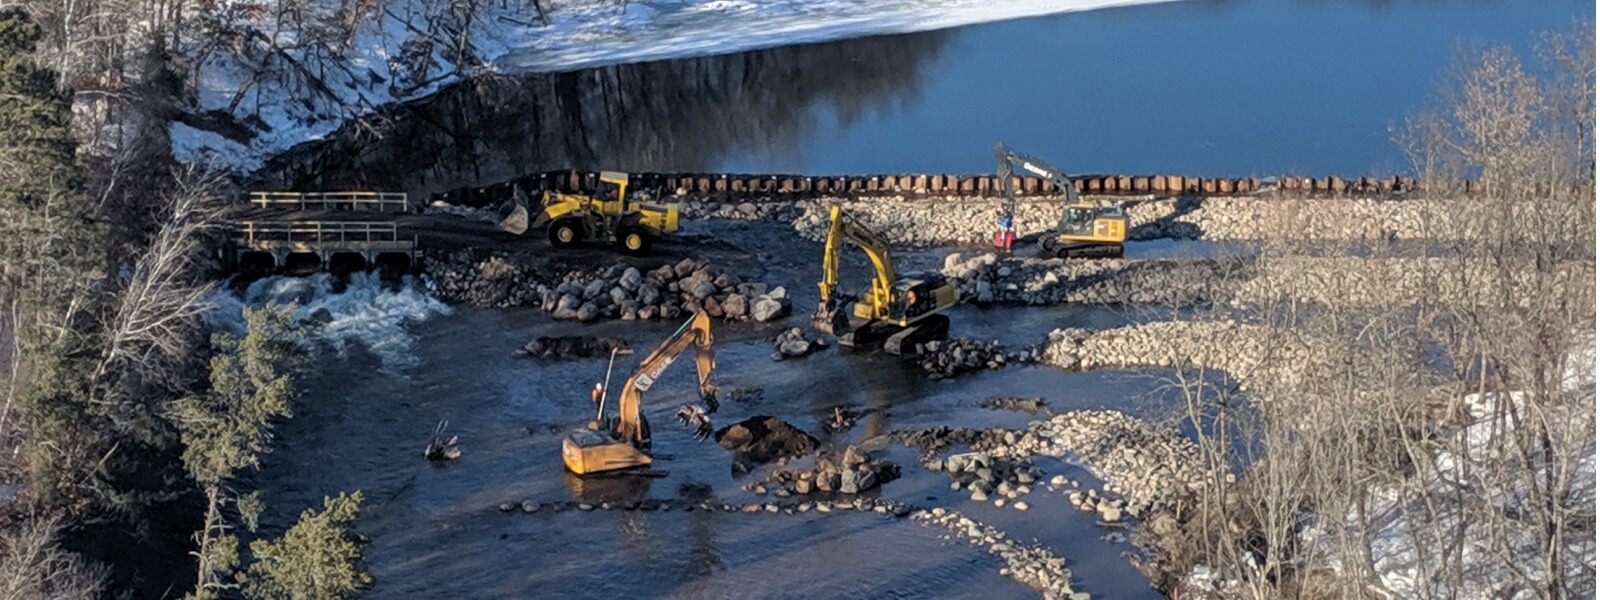 construction trucks dredging a river